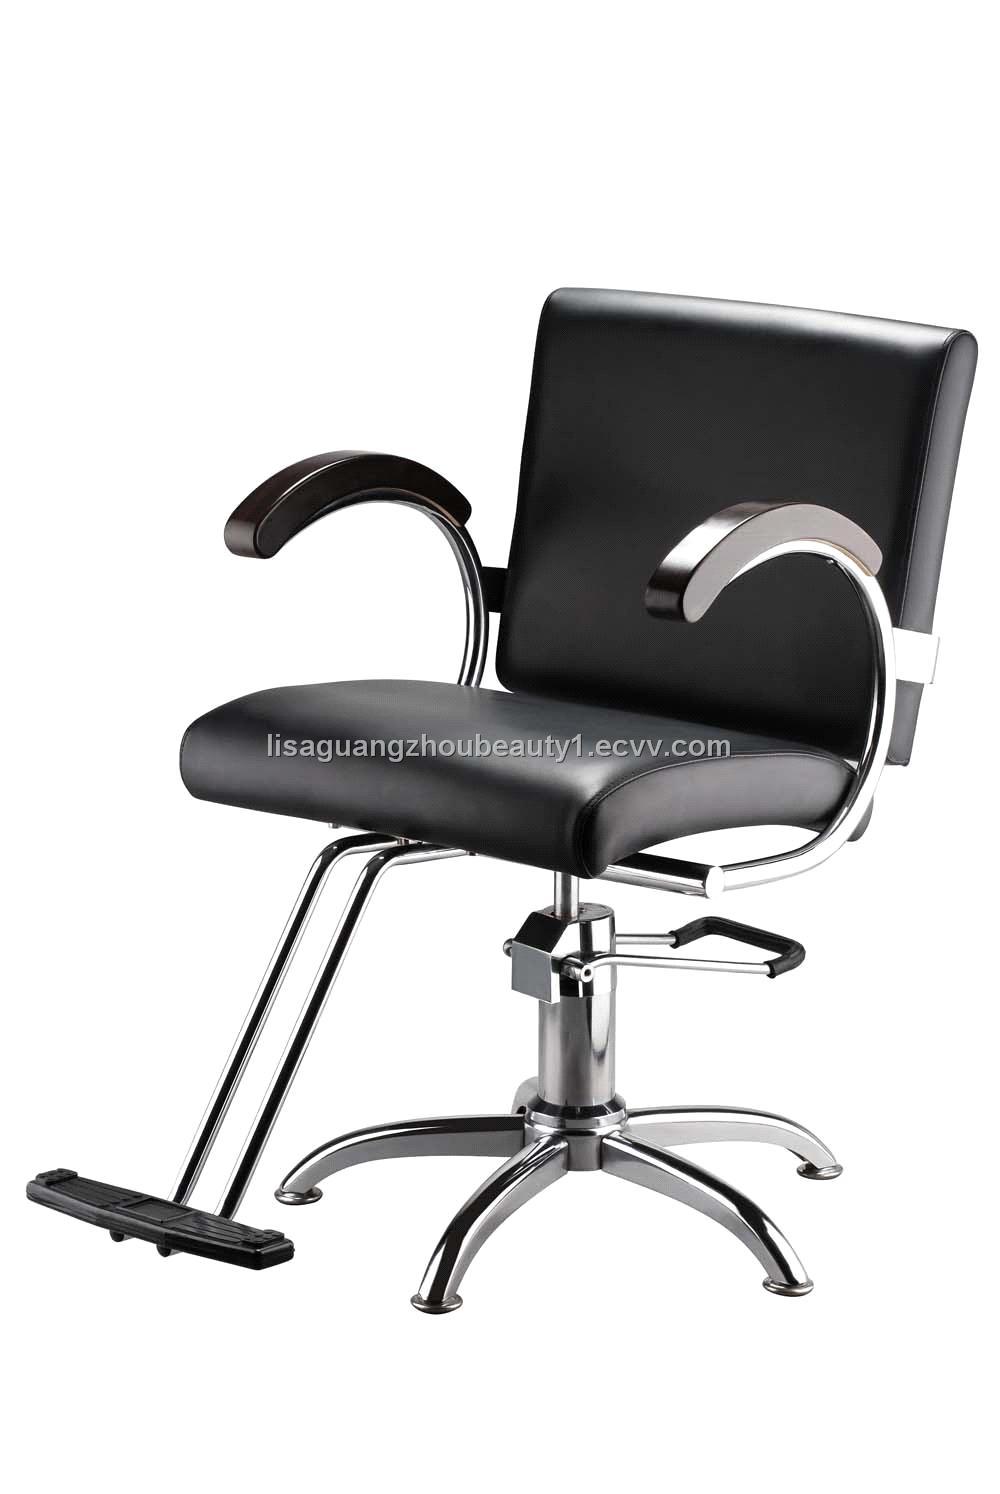 salon beauty equipment barber hydraulic chair hair backwash beauty salon styling chair hydraulic